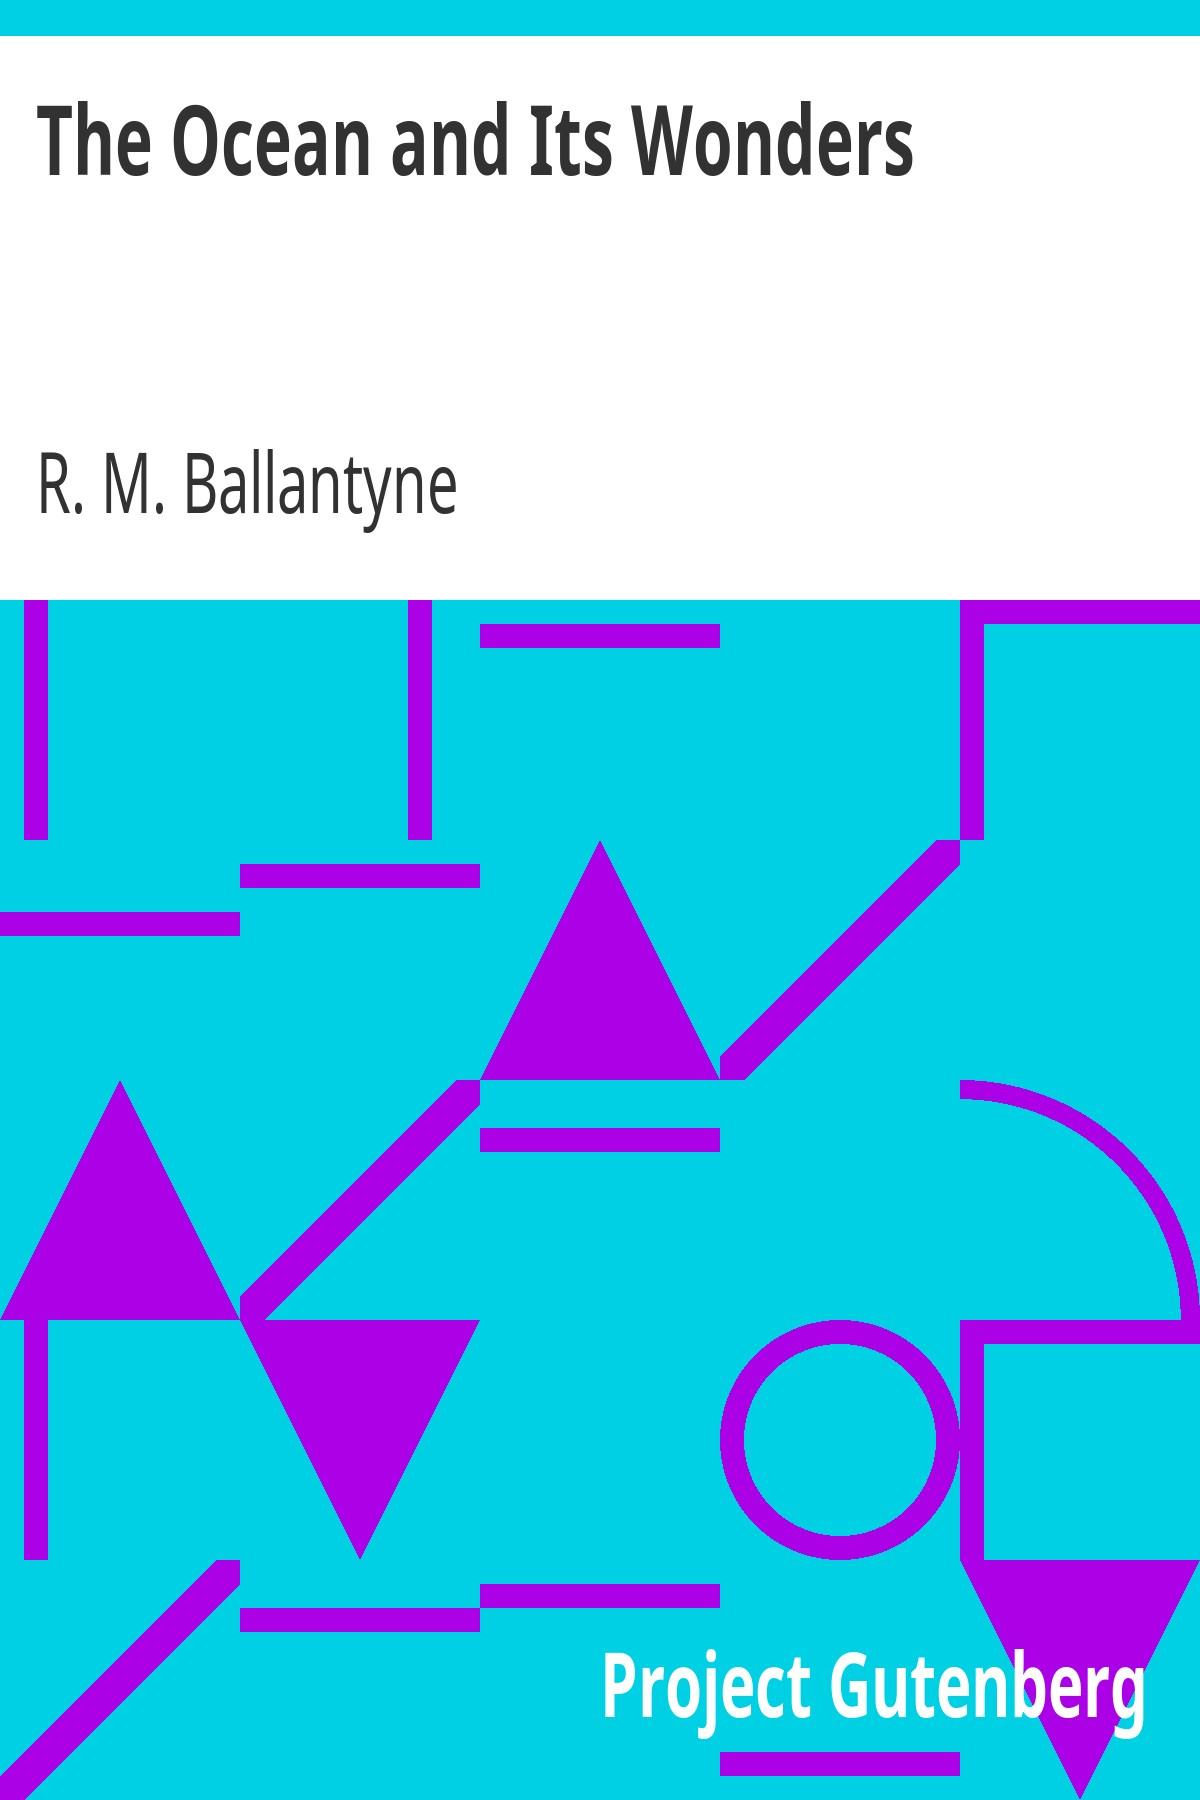 R. M. Ballantyne The Ocean and Its Wonders